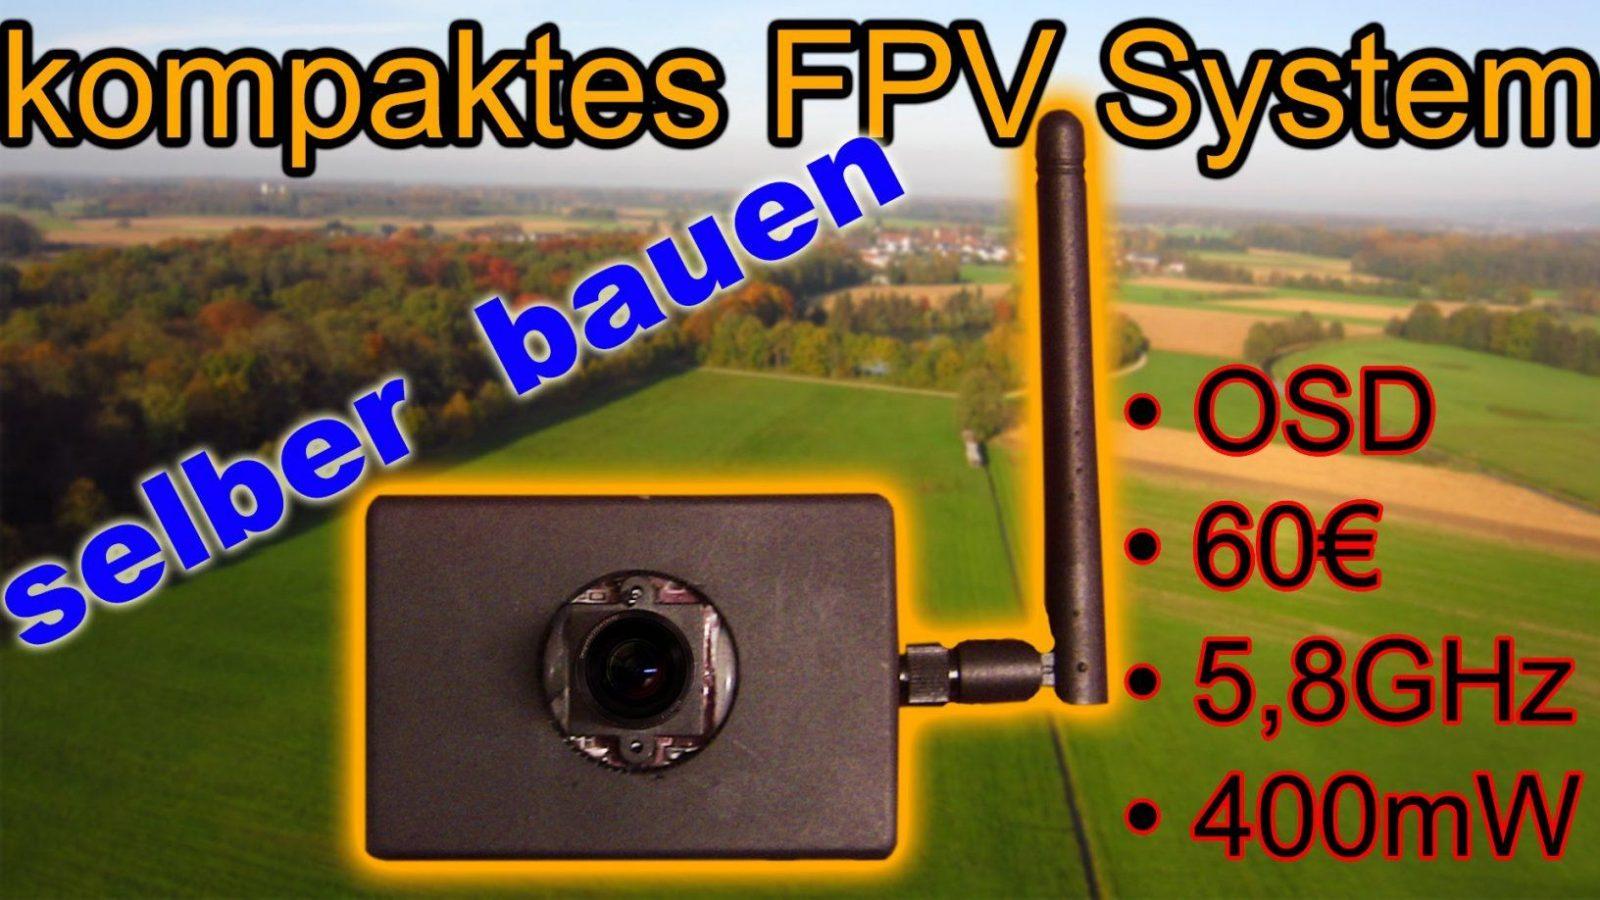 Kompaktes Fpv System Selber Bauen  Full Hd  Tutorial  Youtube von Fpv Brille Selber Bauen Photo